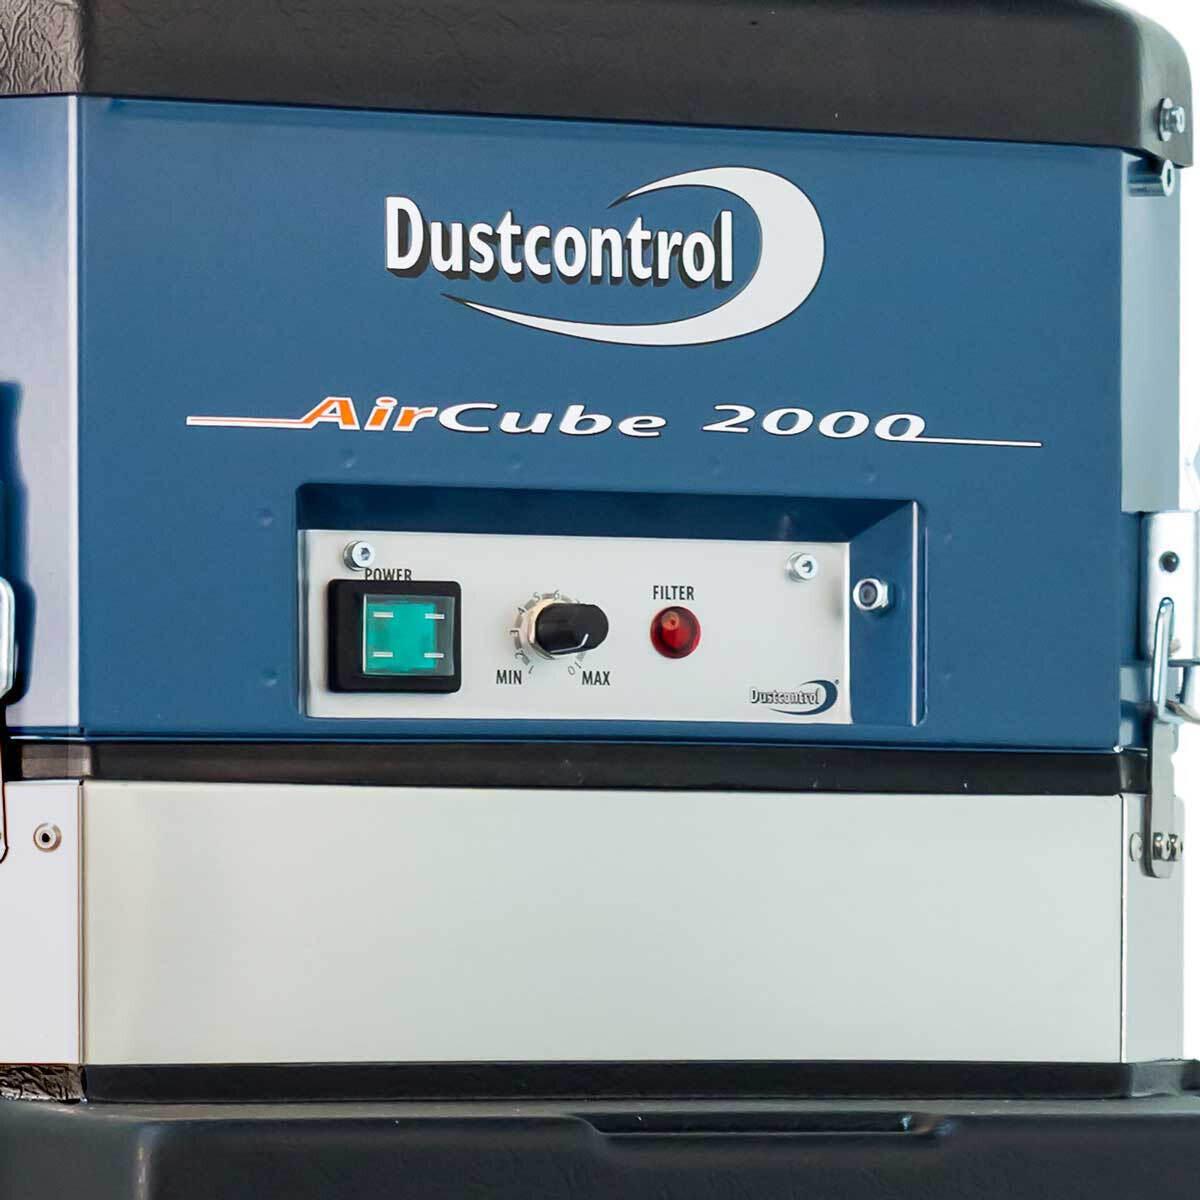 DC AirCube 2000 Control Panel